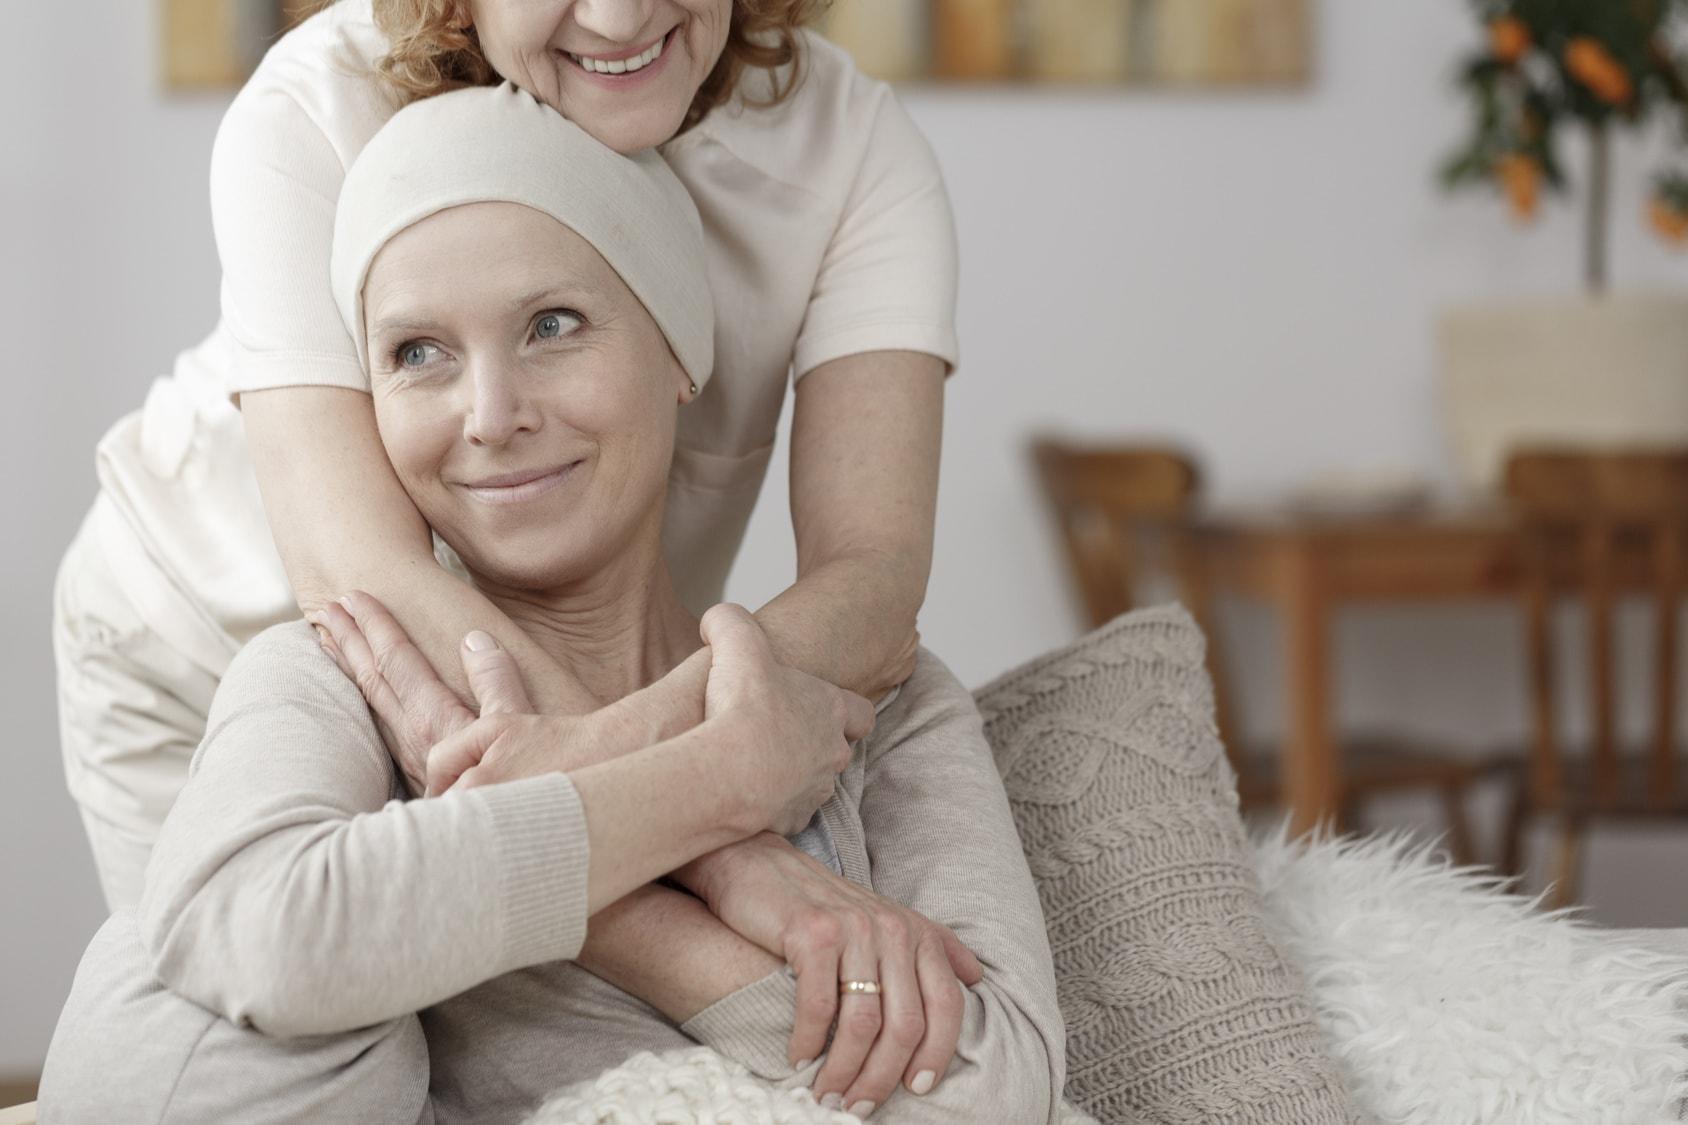 Zunehmen bei Krebs - BLog - Philip baum - Nahrungsergänzungsmittel zum zunehmen